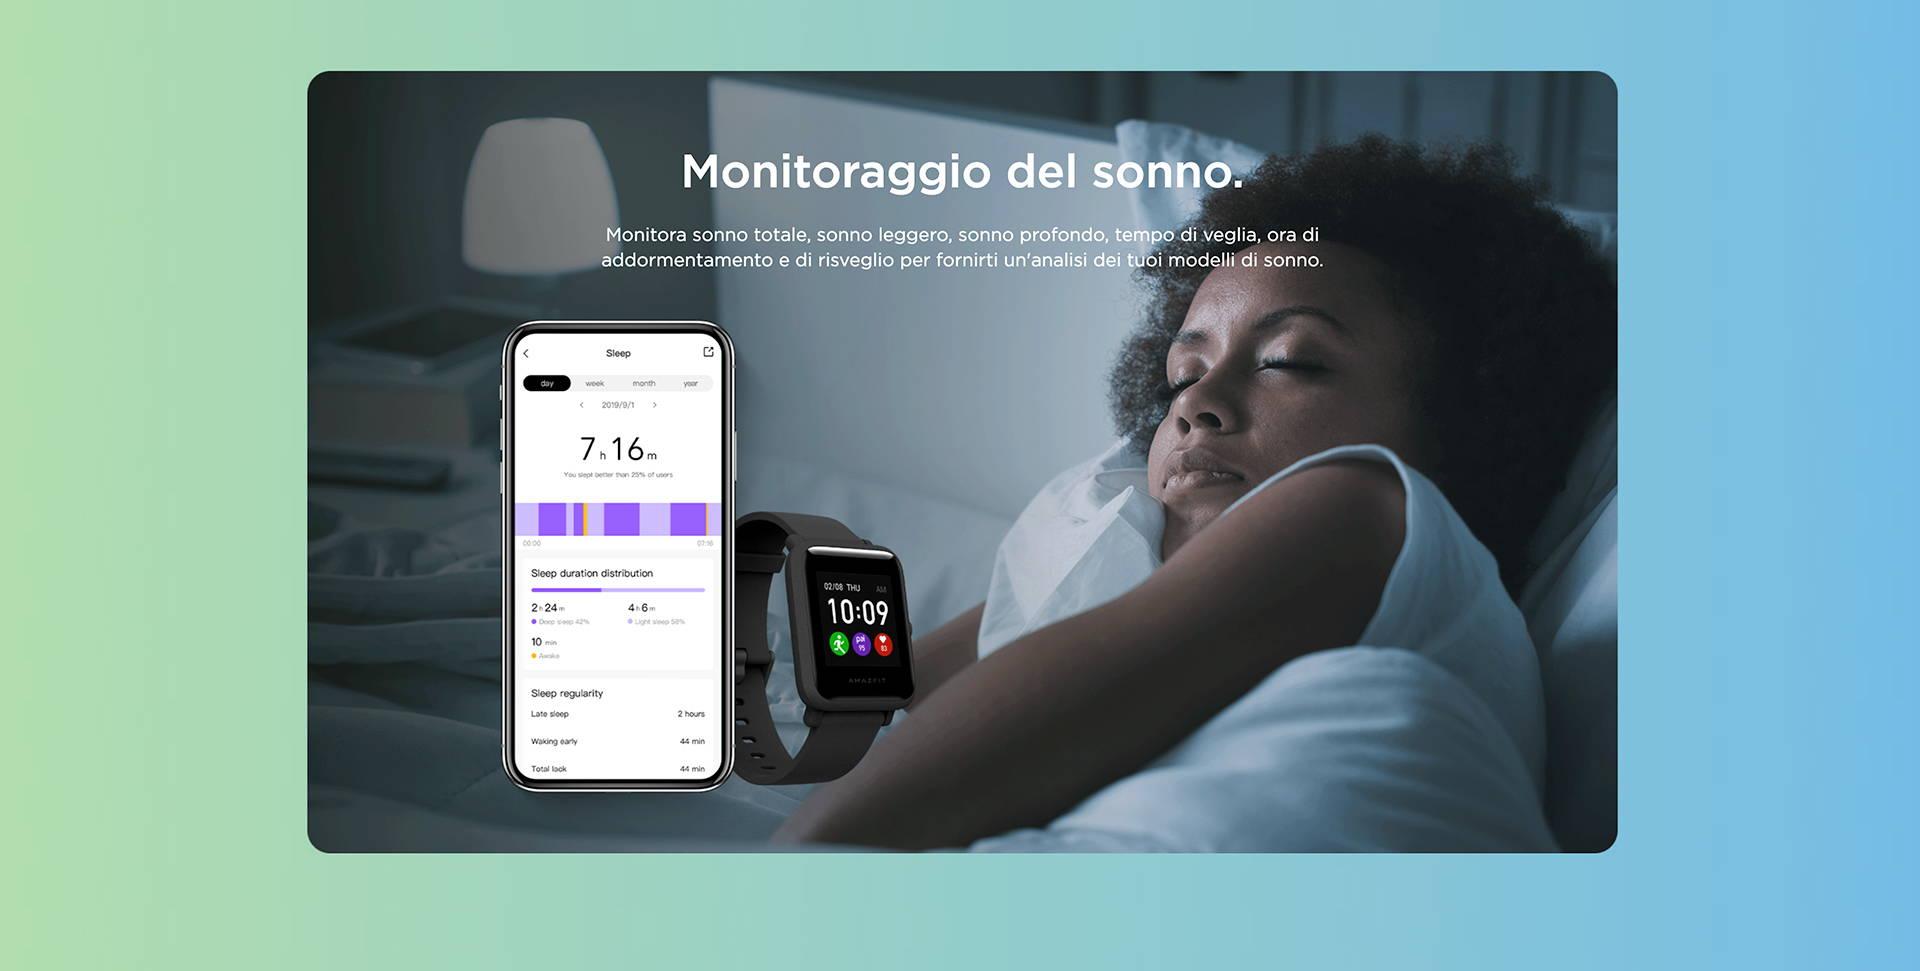 Amazfit IT - Amazfit Bip S Lite - Monitoraggio del sonno.